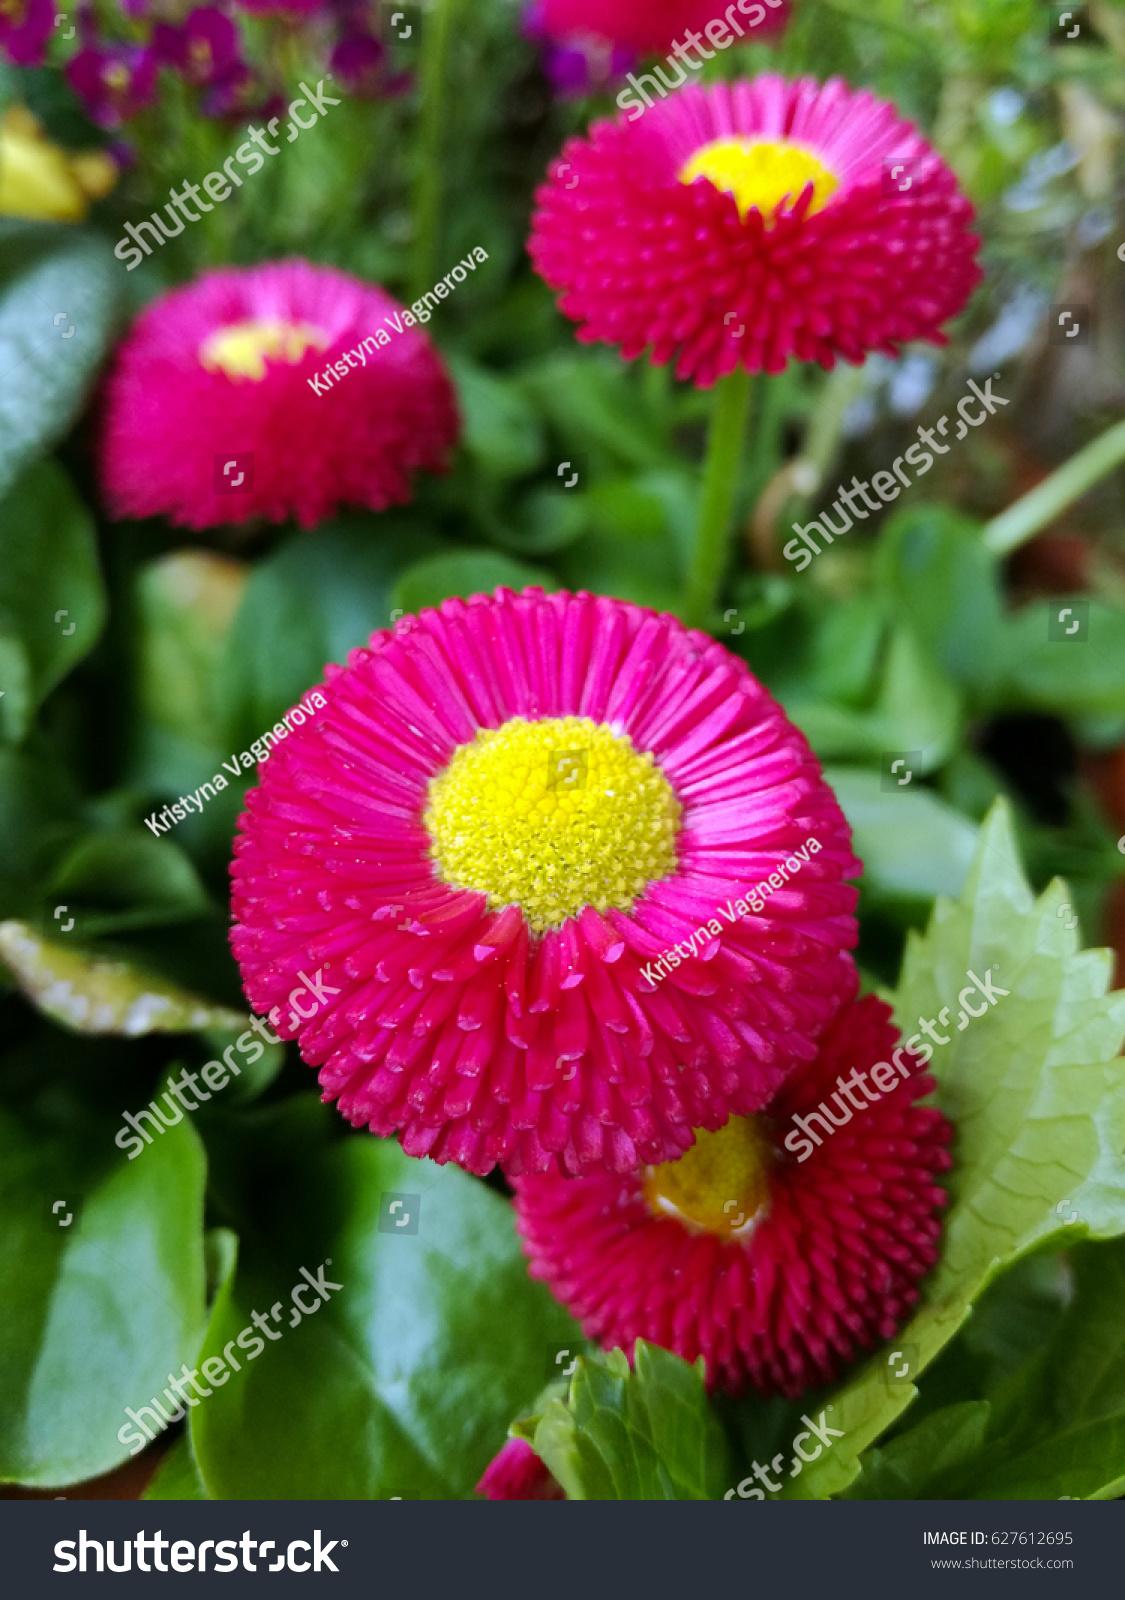 Dark pink english daisy flower bellis stock photo edit now dark pink english daisy flower or bellis perennis blooming flowers close up image of izmirmasajfo